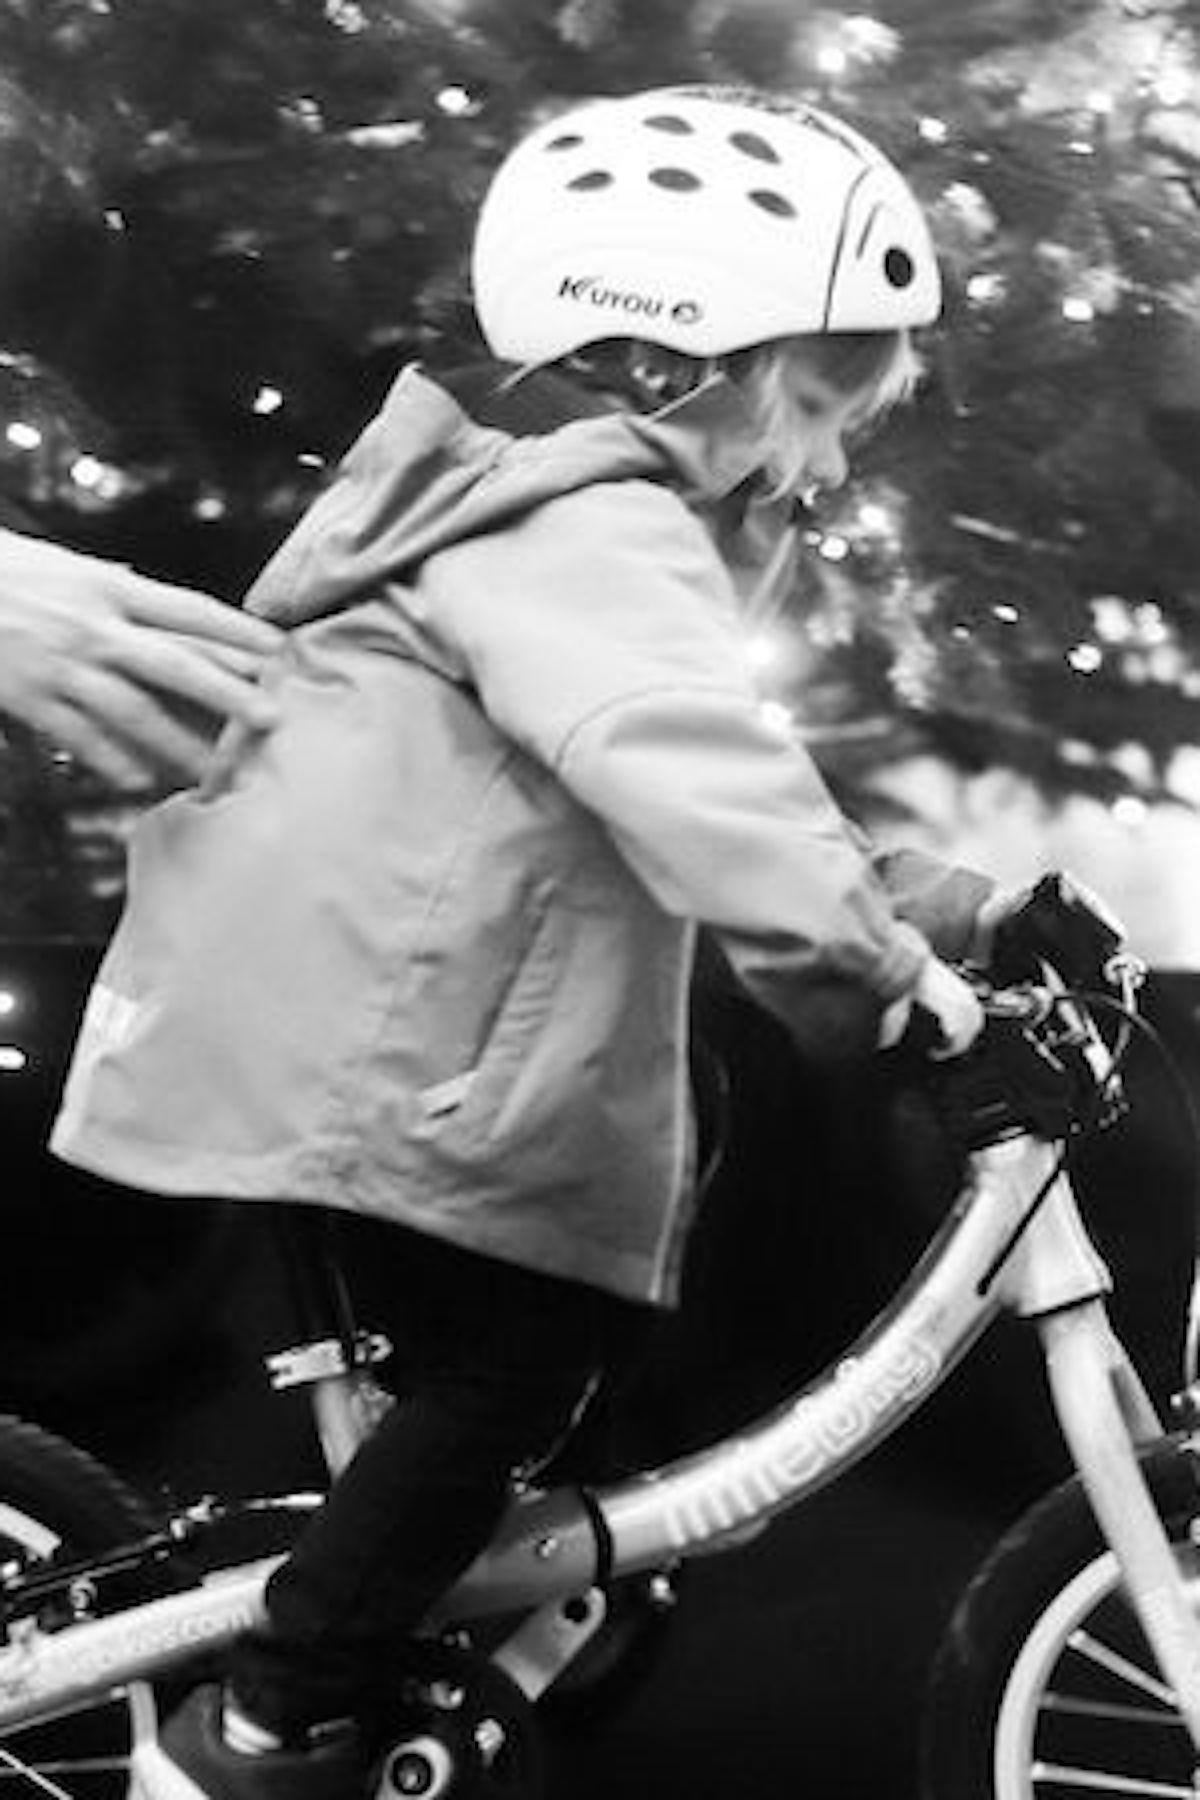 It's beginning to look a lot like… LittleBig Bikes